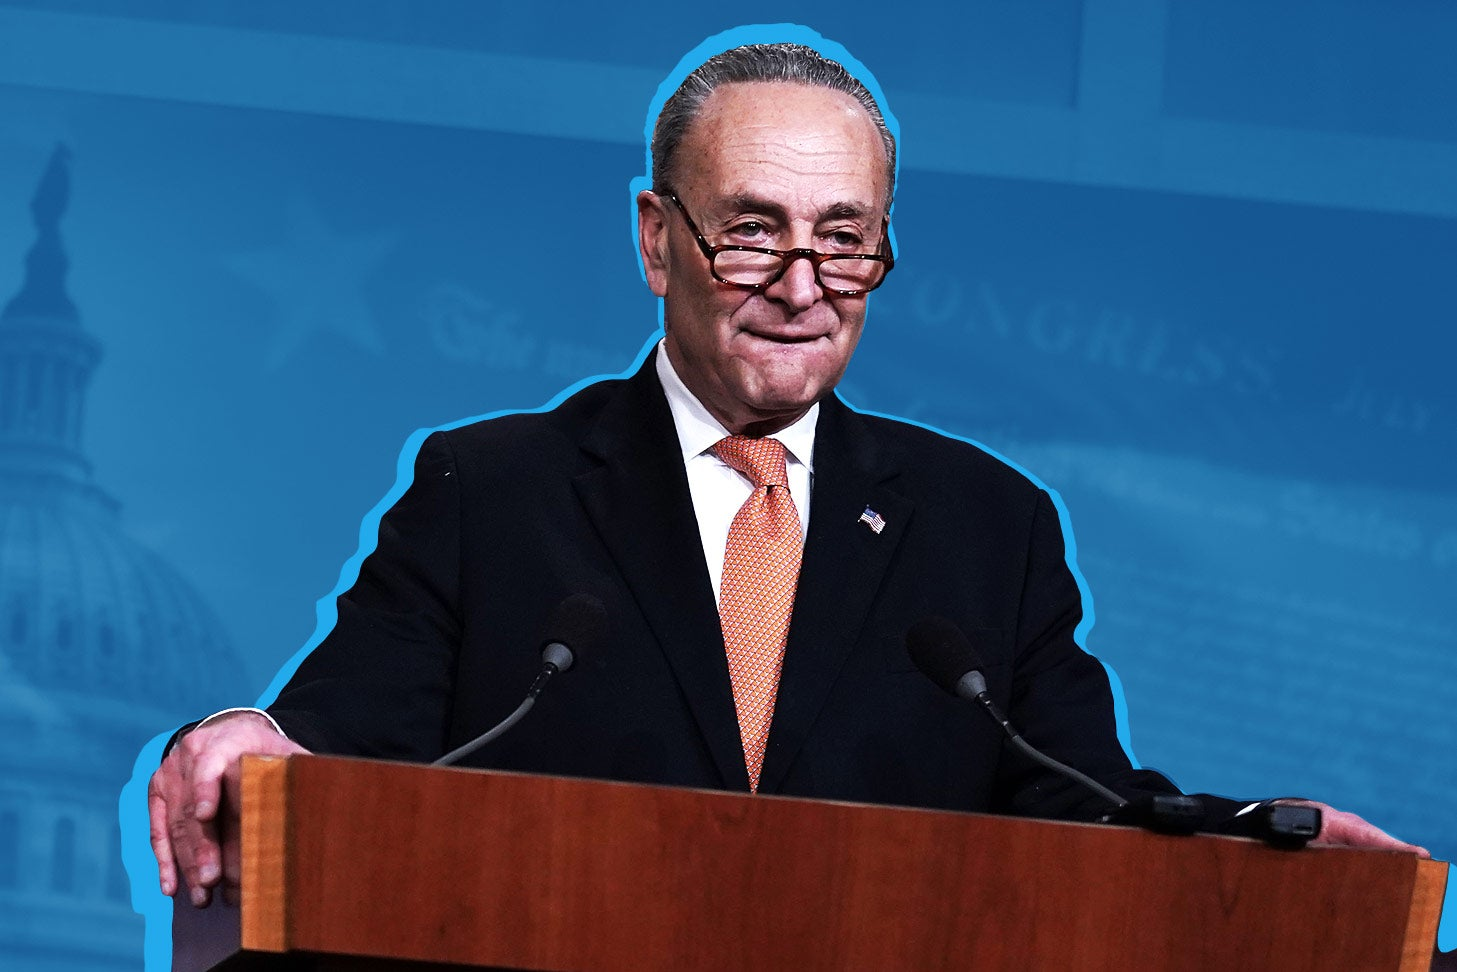 U.S. Senate Minority Leader Sen. Chuck Schumer speaks during a news conference on Saturday in Washington.